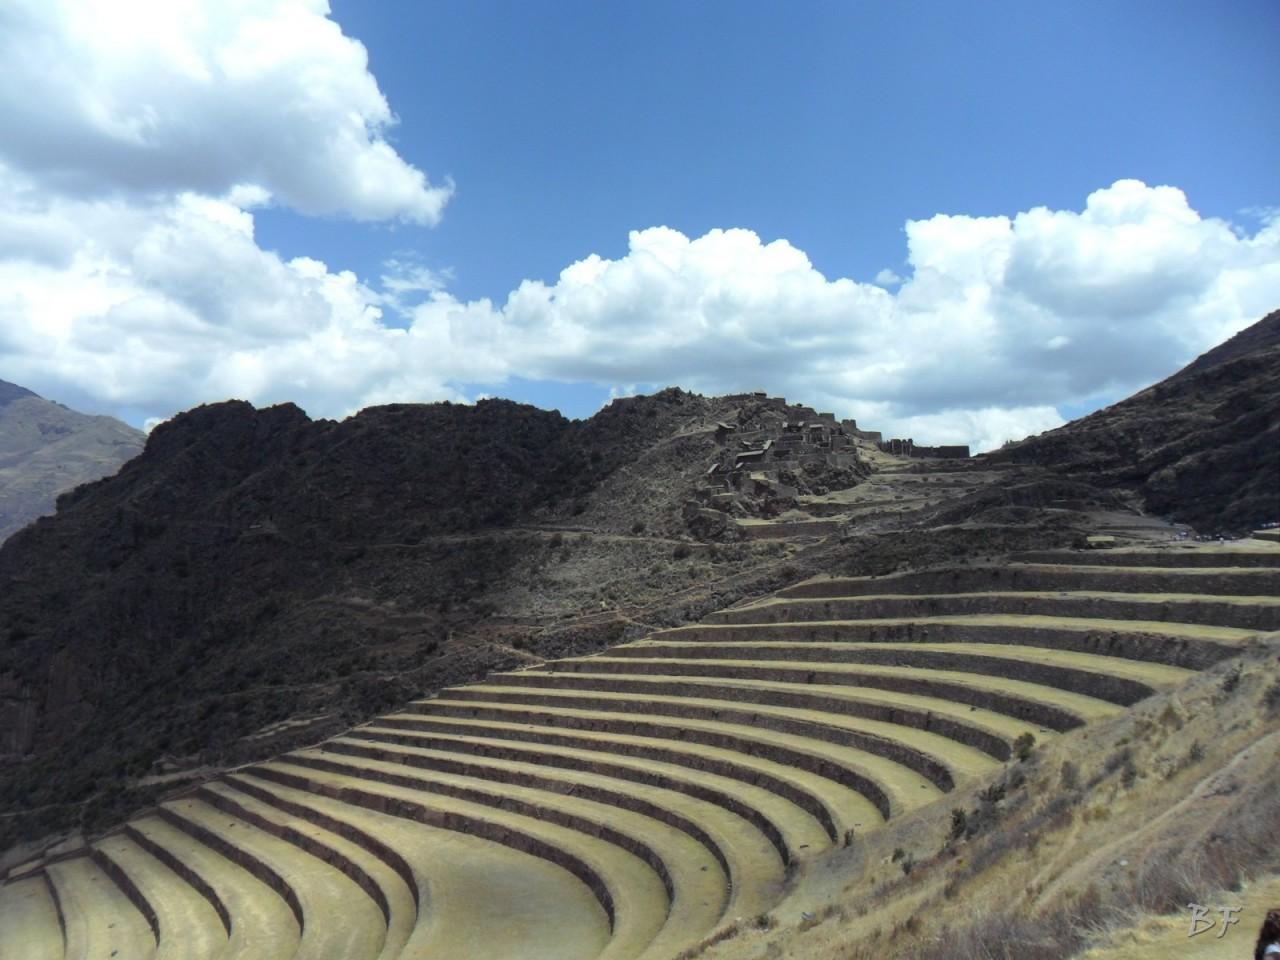 Mura-Poligonali-Megaliti-Altari-Rupestri-Pisac-Cusco-Perù-5